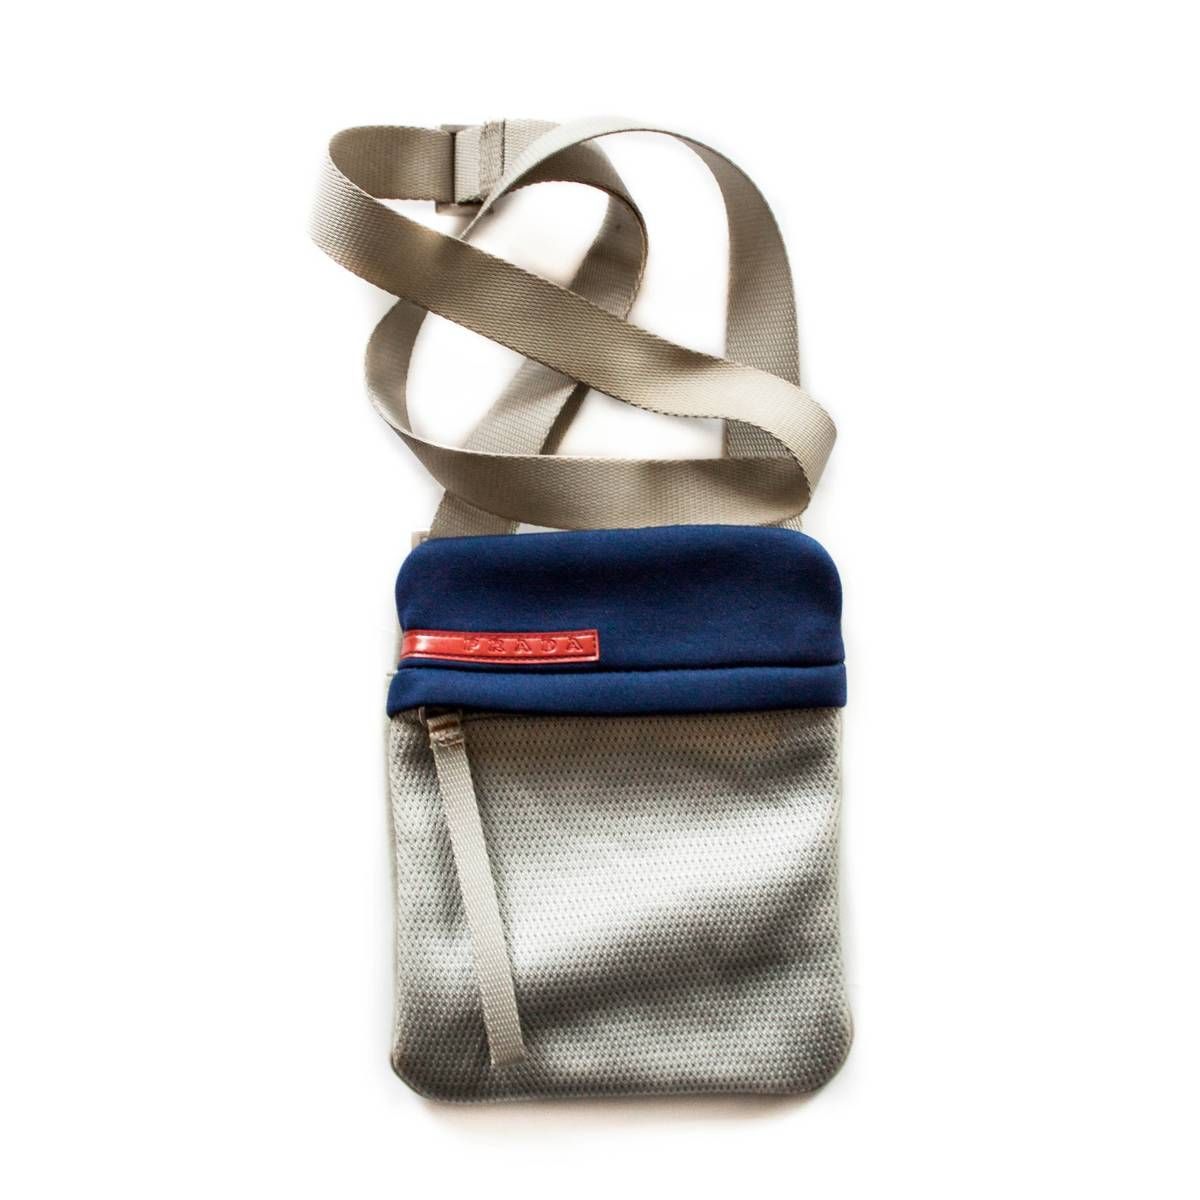 8df94c4450fc Buy Prada Sport Shoulder Bag, Size: ONE SIZE, Description: Item Prada Sport  Shoulder Bag Color Beige/Blue Condition 8/10 - some sunburn right under the  ...